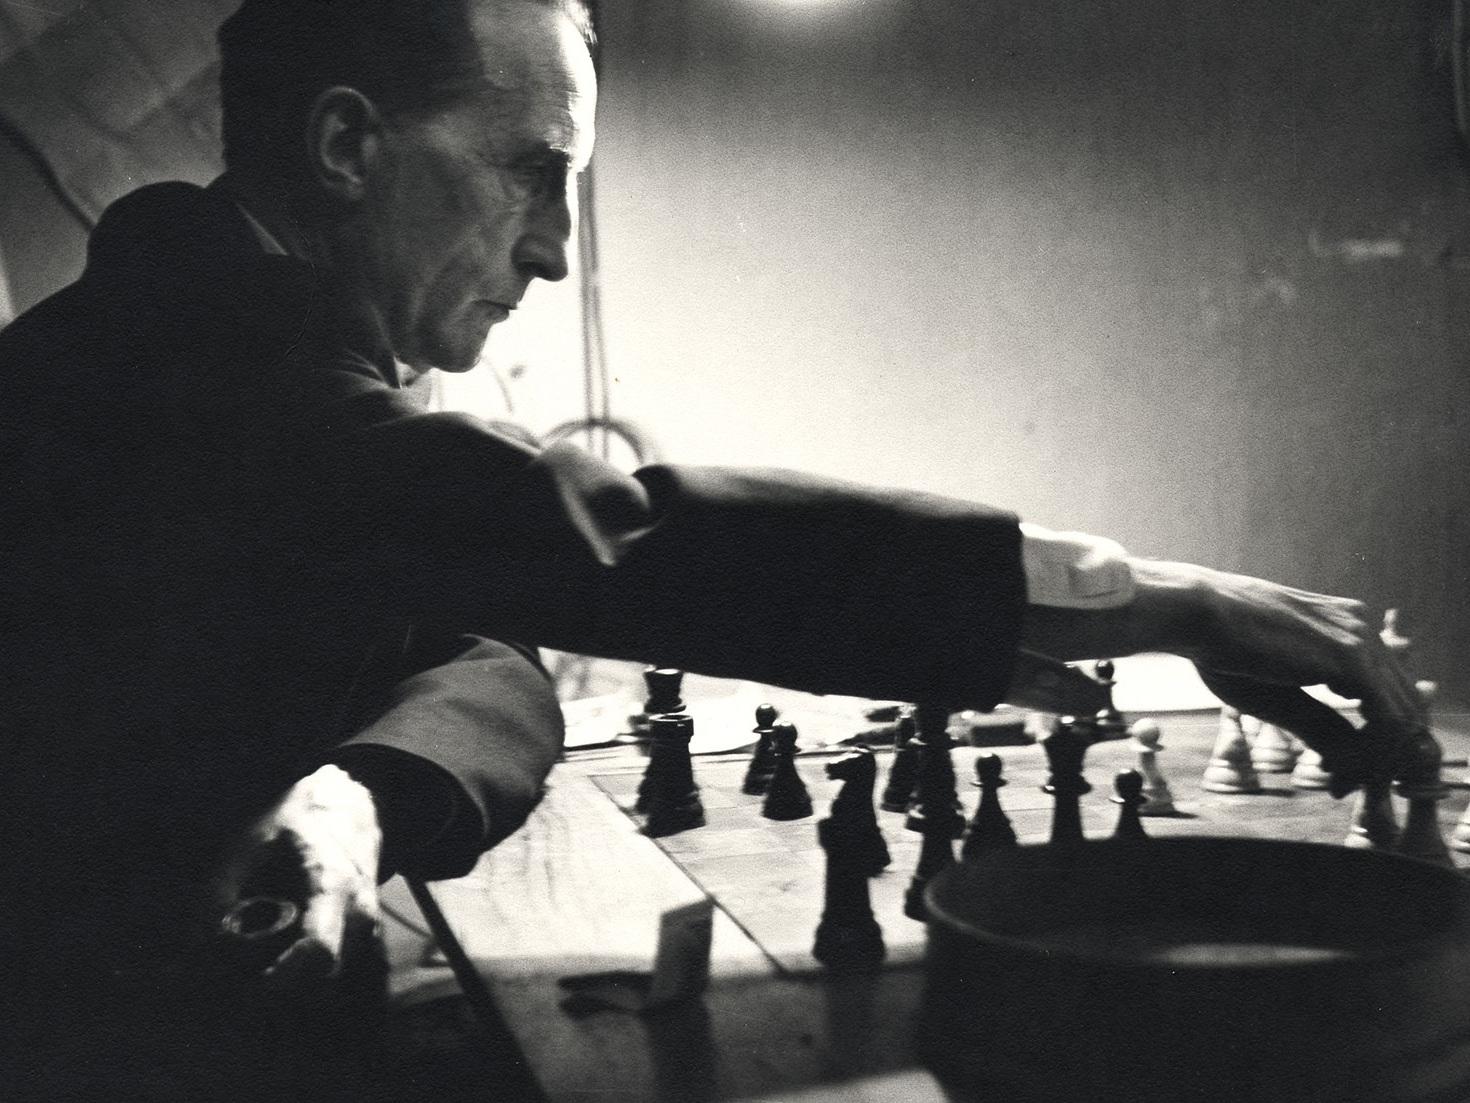 Marcel+Duchamp